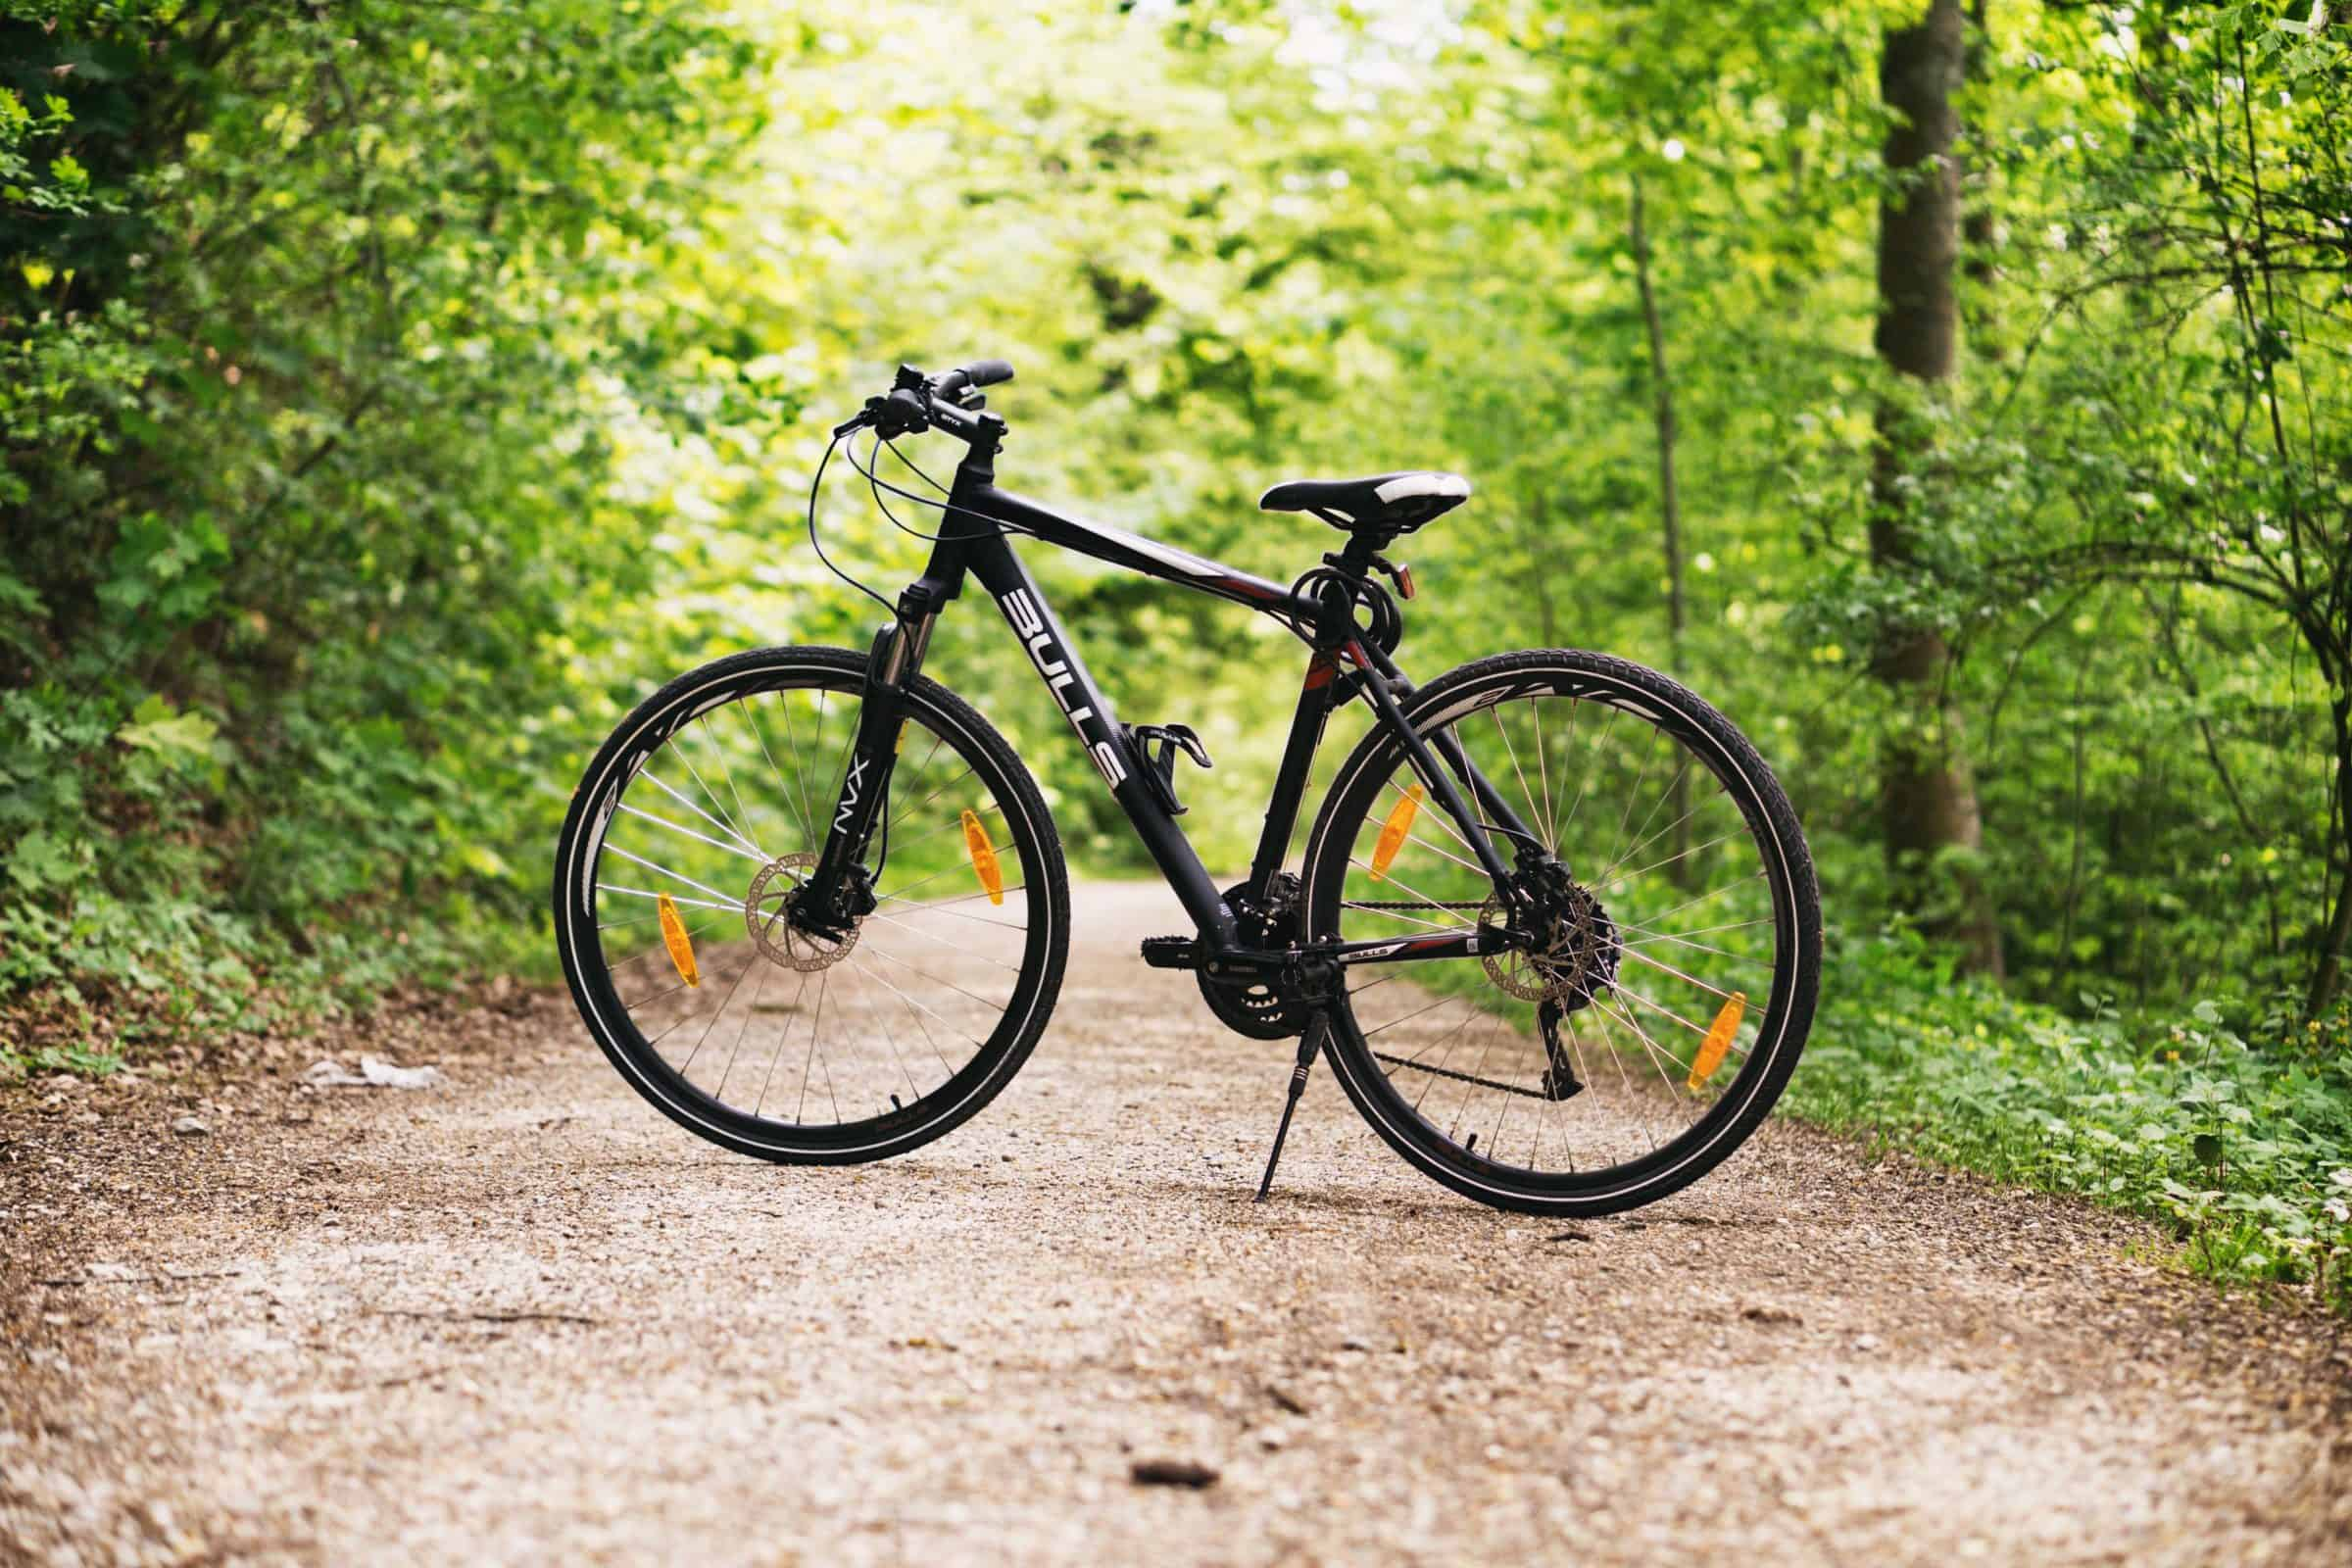 bike for heavy riders under 500